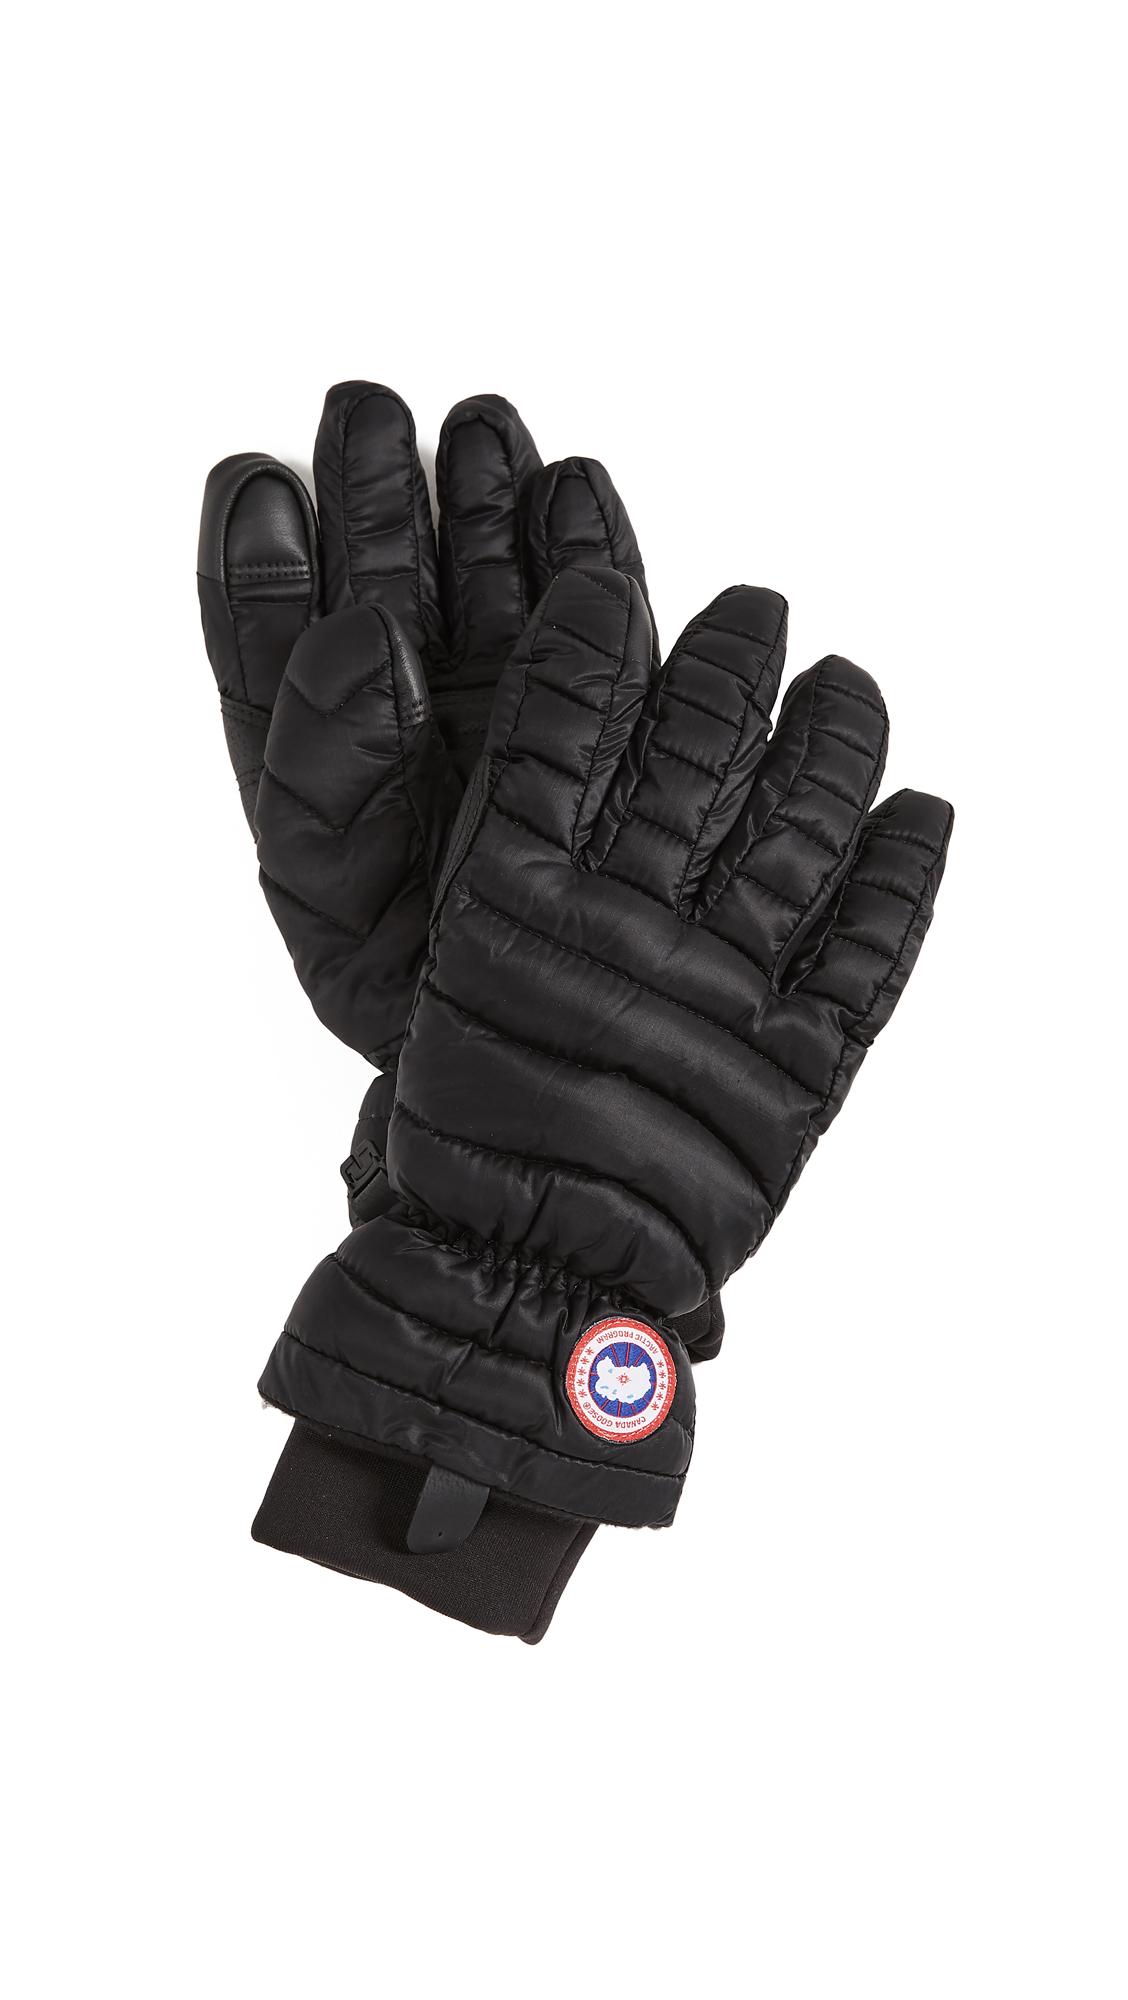 Canada Goose Lightweight Gloves - Black